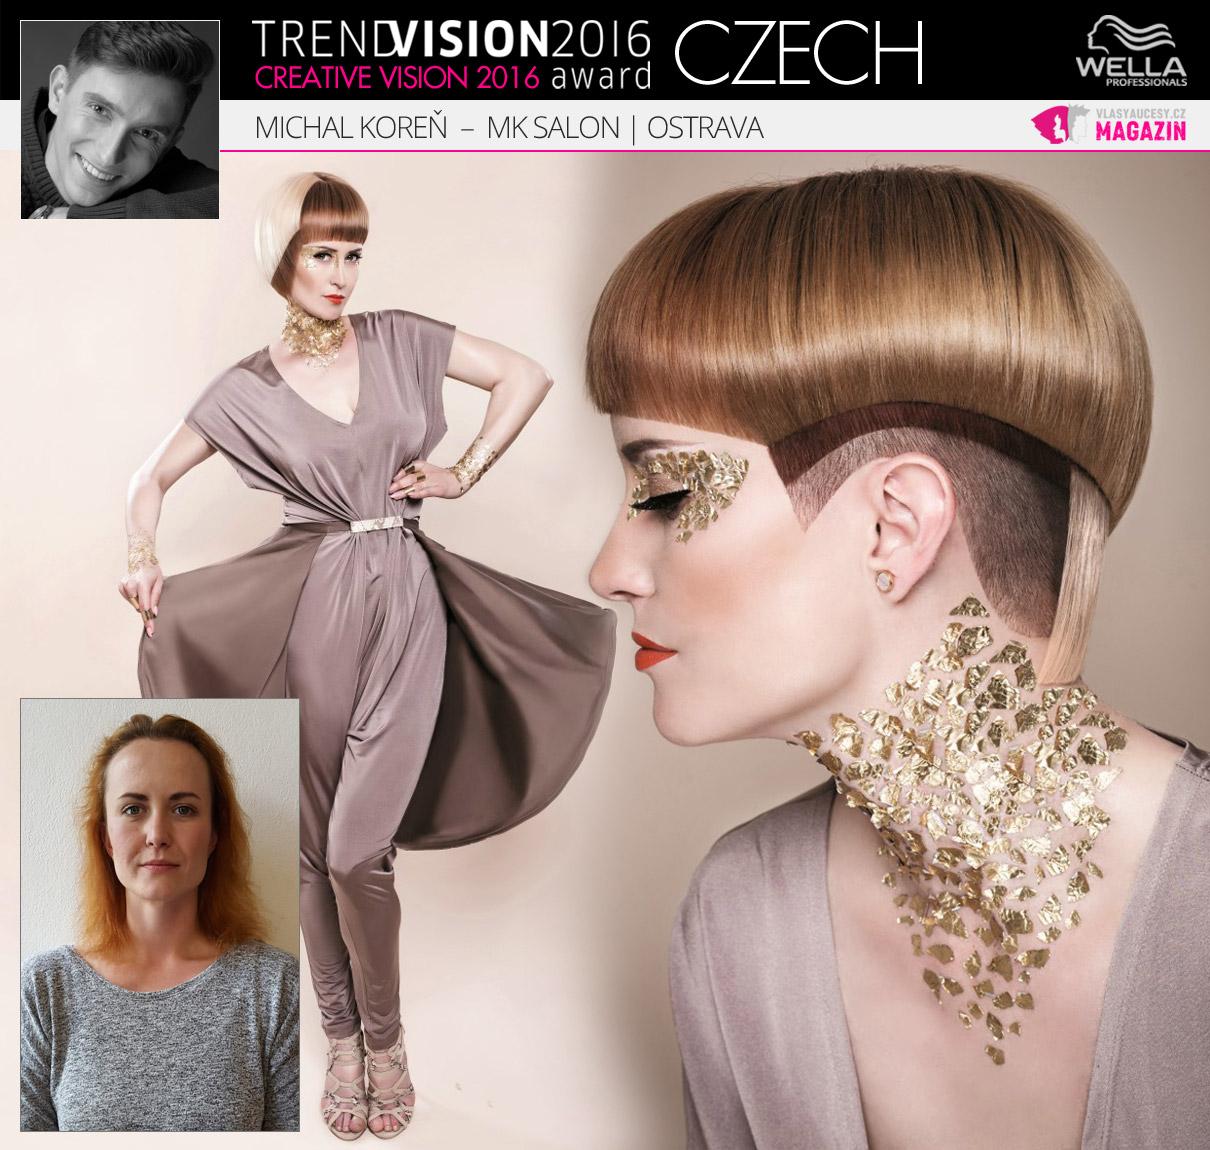 Michal Koreň, MK Salon, Ostrava –Wella Professionals Trend Vision Award Česká republika, kategorie Creative Vision 2016.